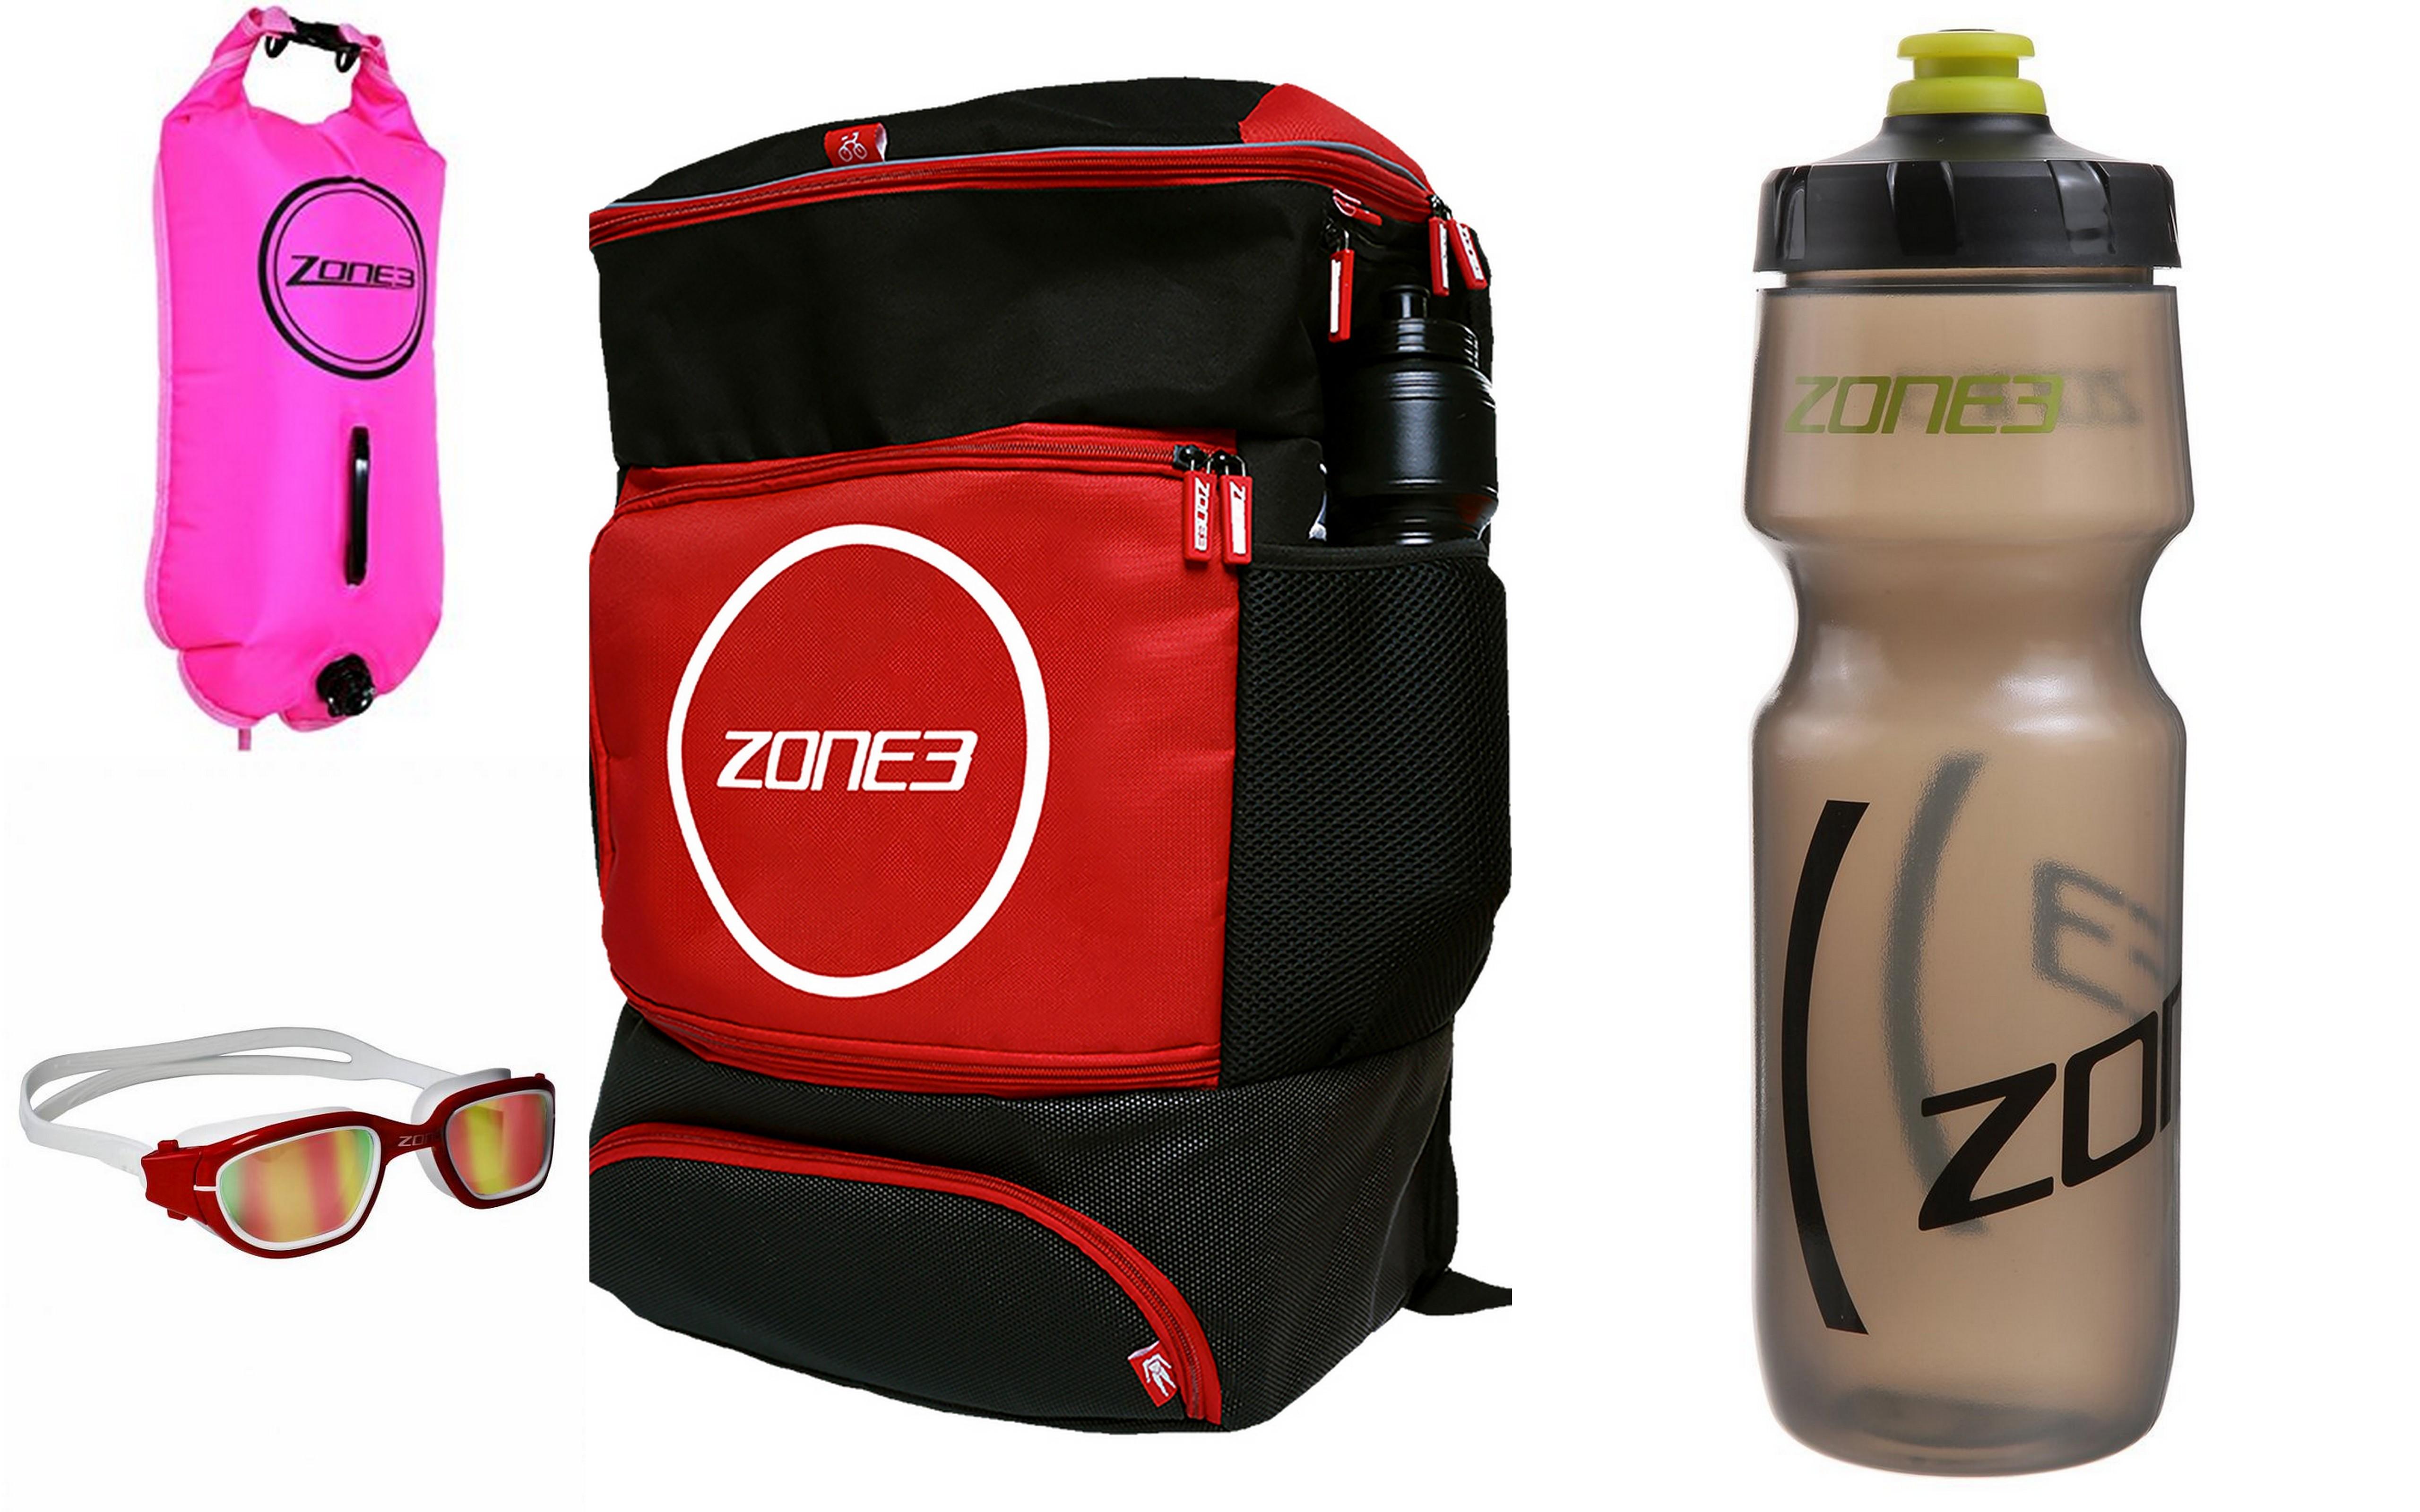 Zone 3 prize